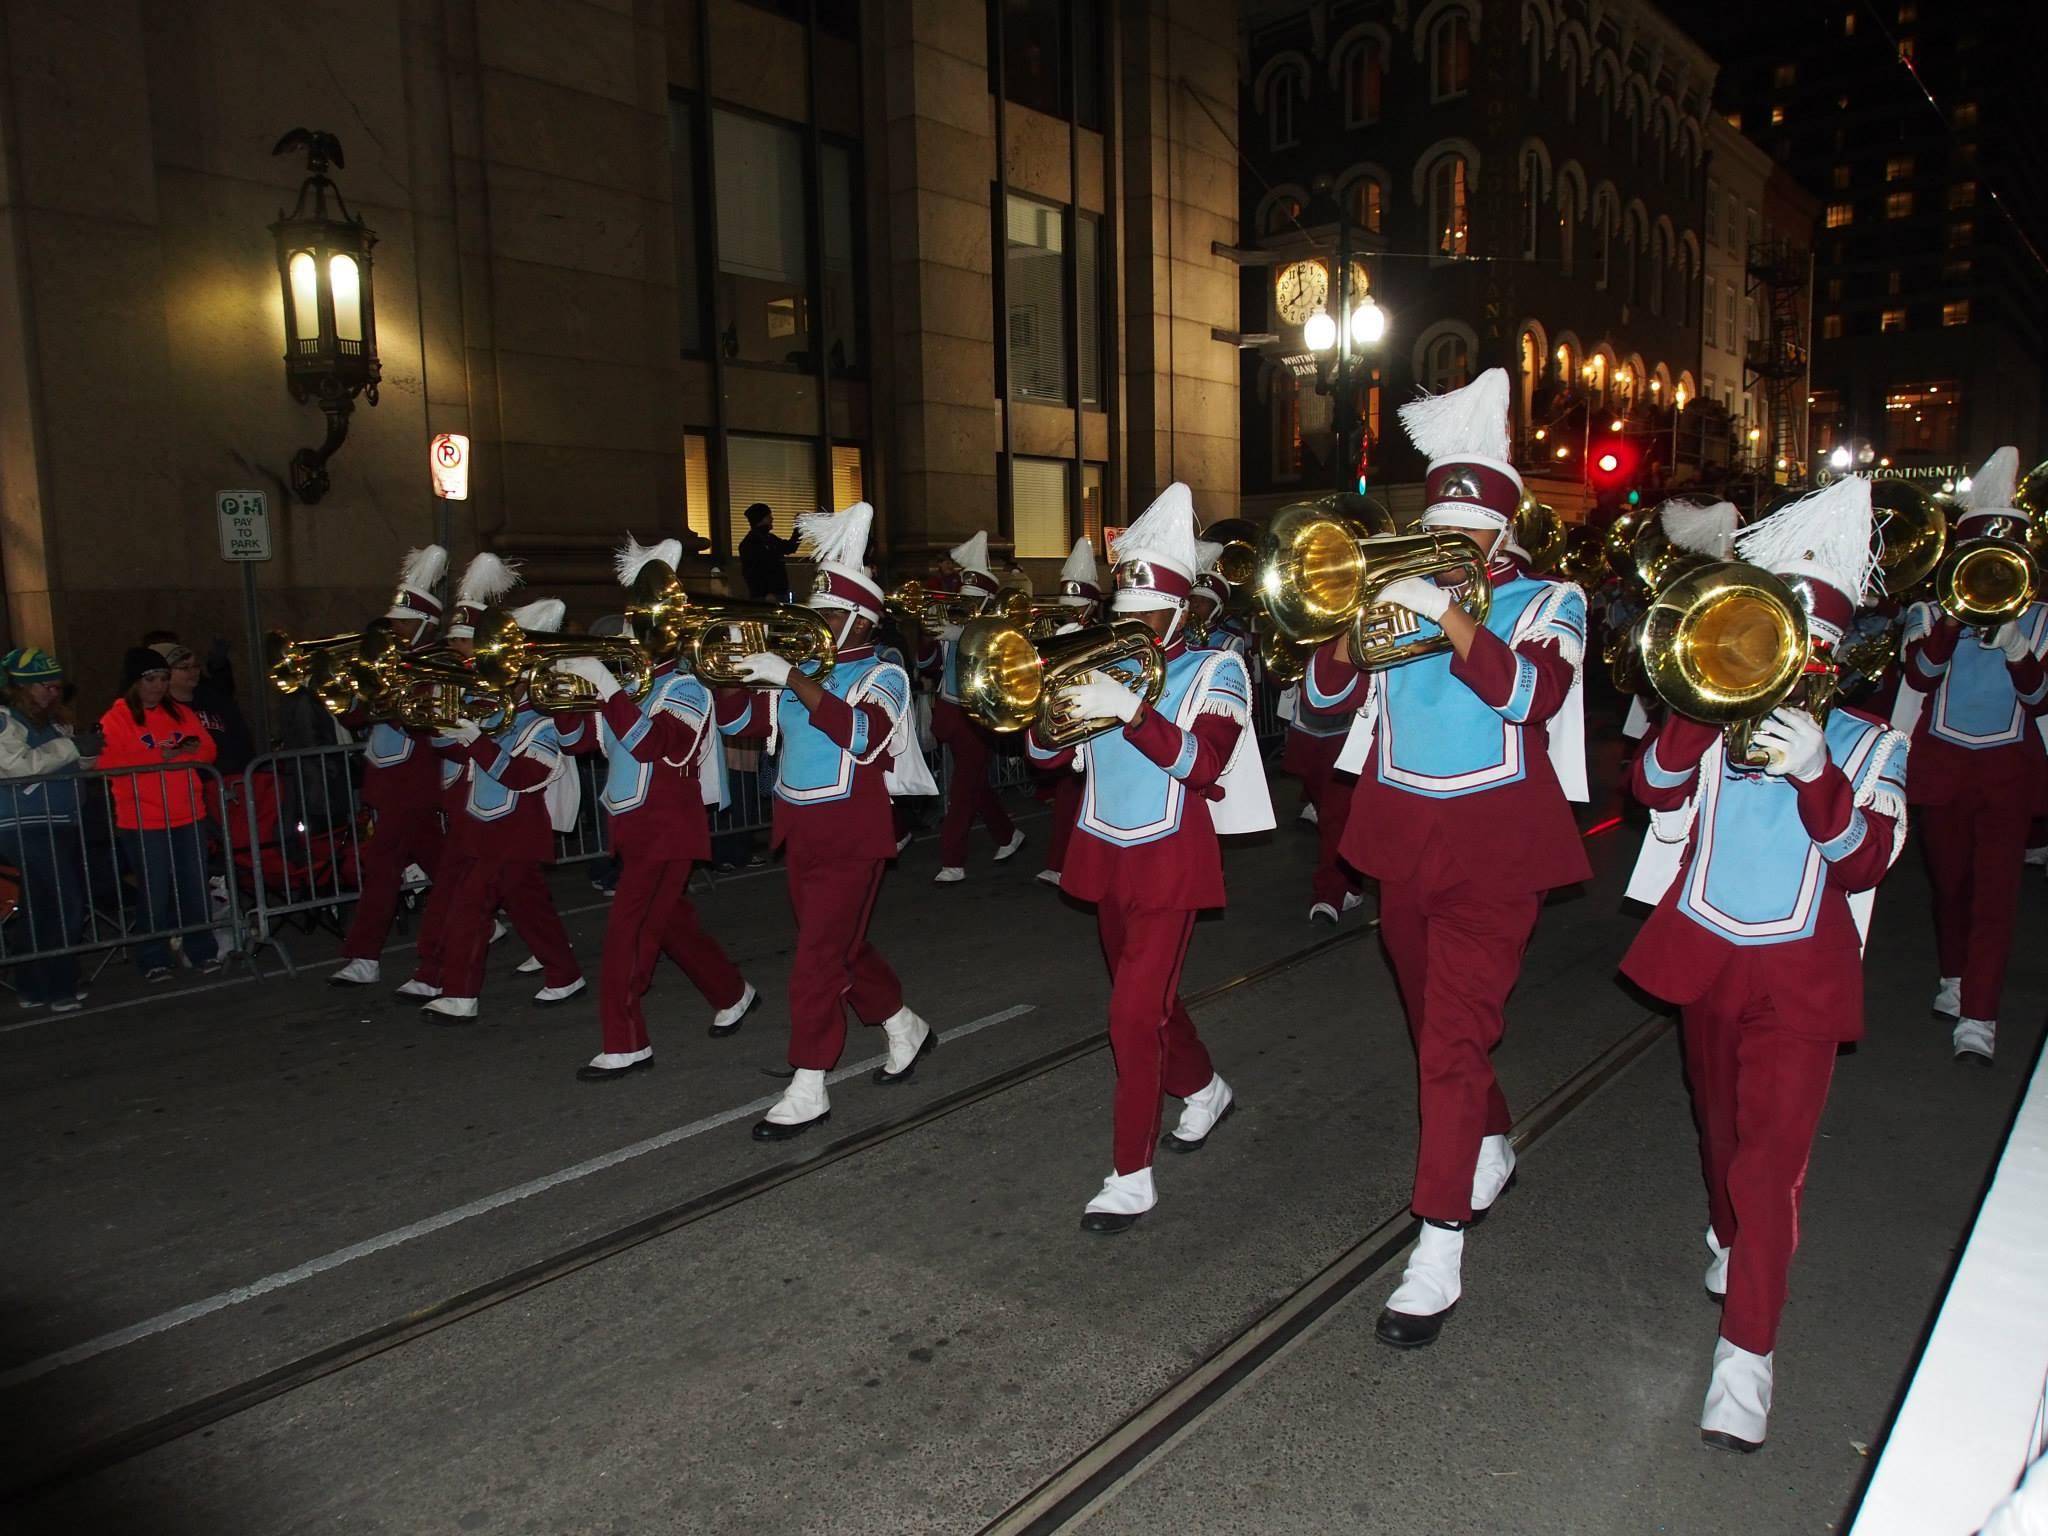 mardi-gras-parade-new-orleans-3